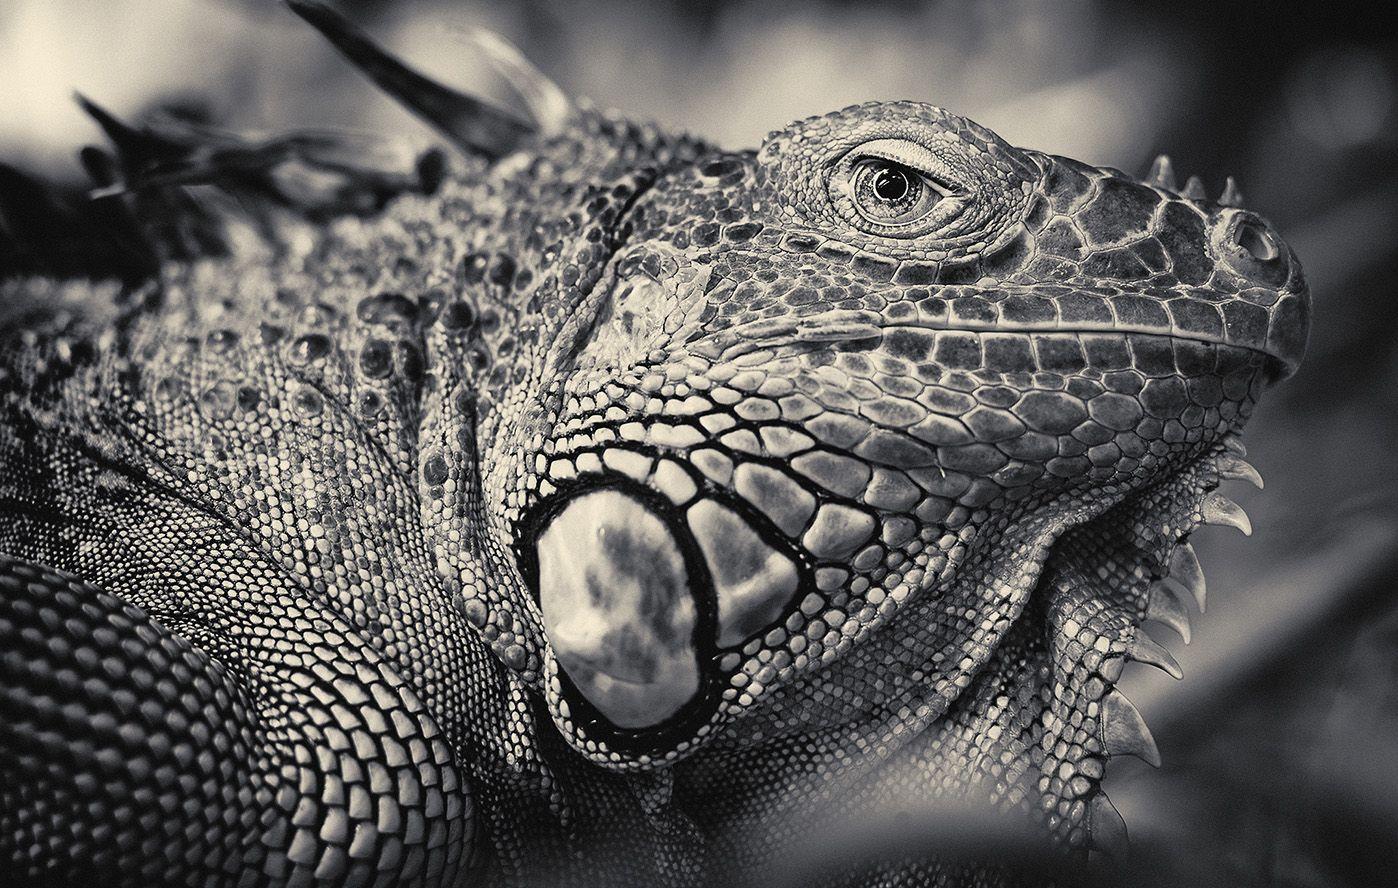 Photo By Antti Viitala Animals Pinterest Animal - Captivating black and white animal portraits by antti viitala